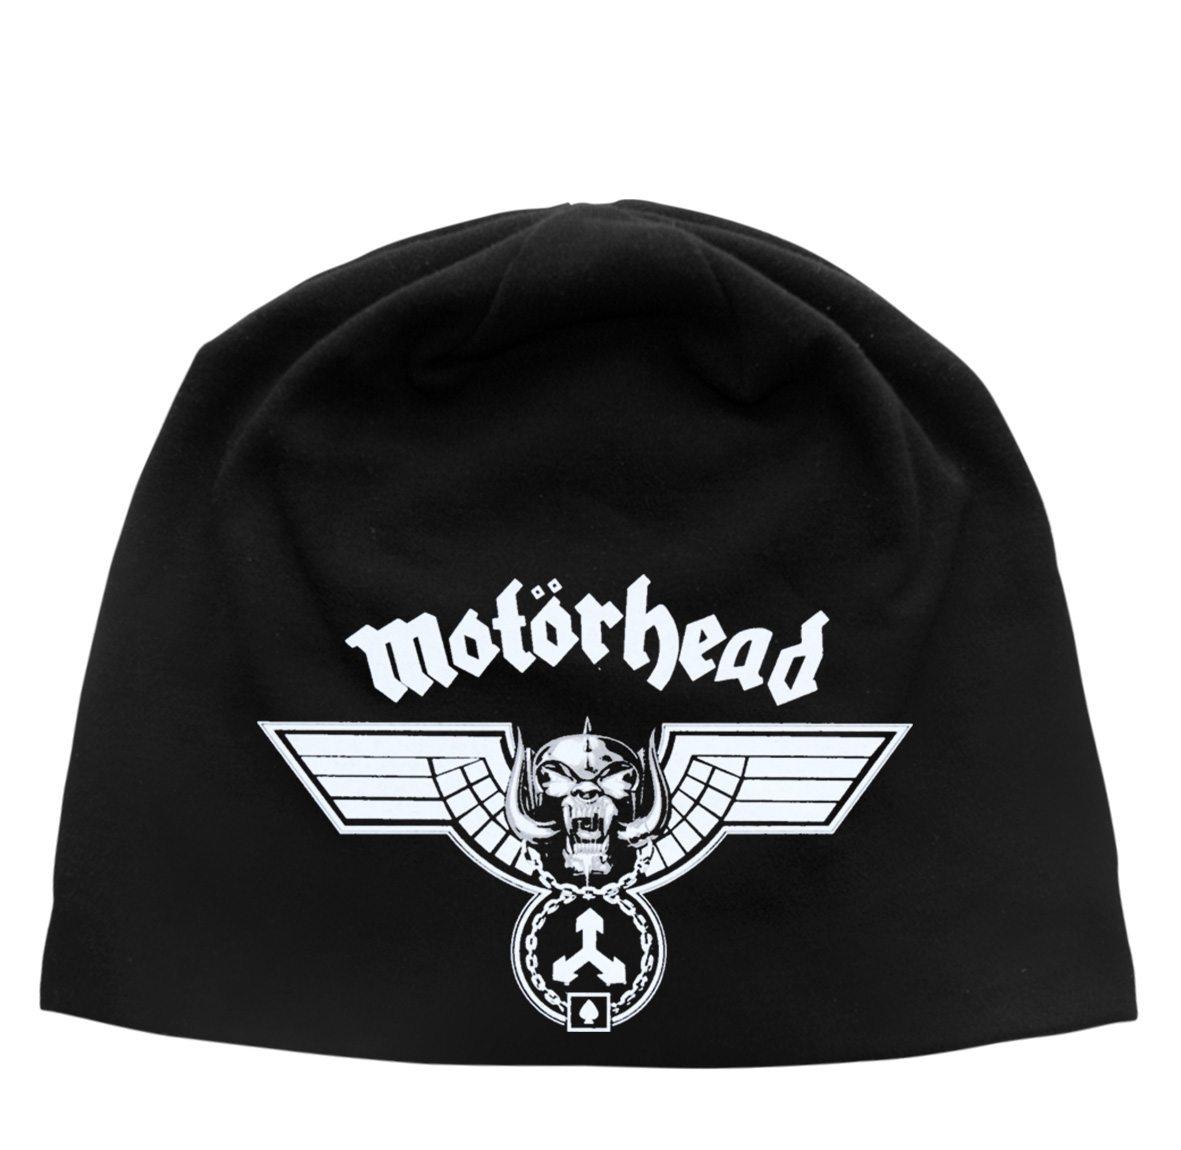 Motorhead Beanie Hat Hammered